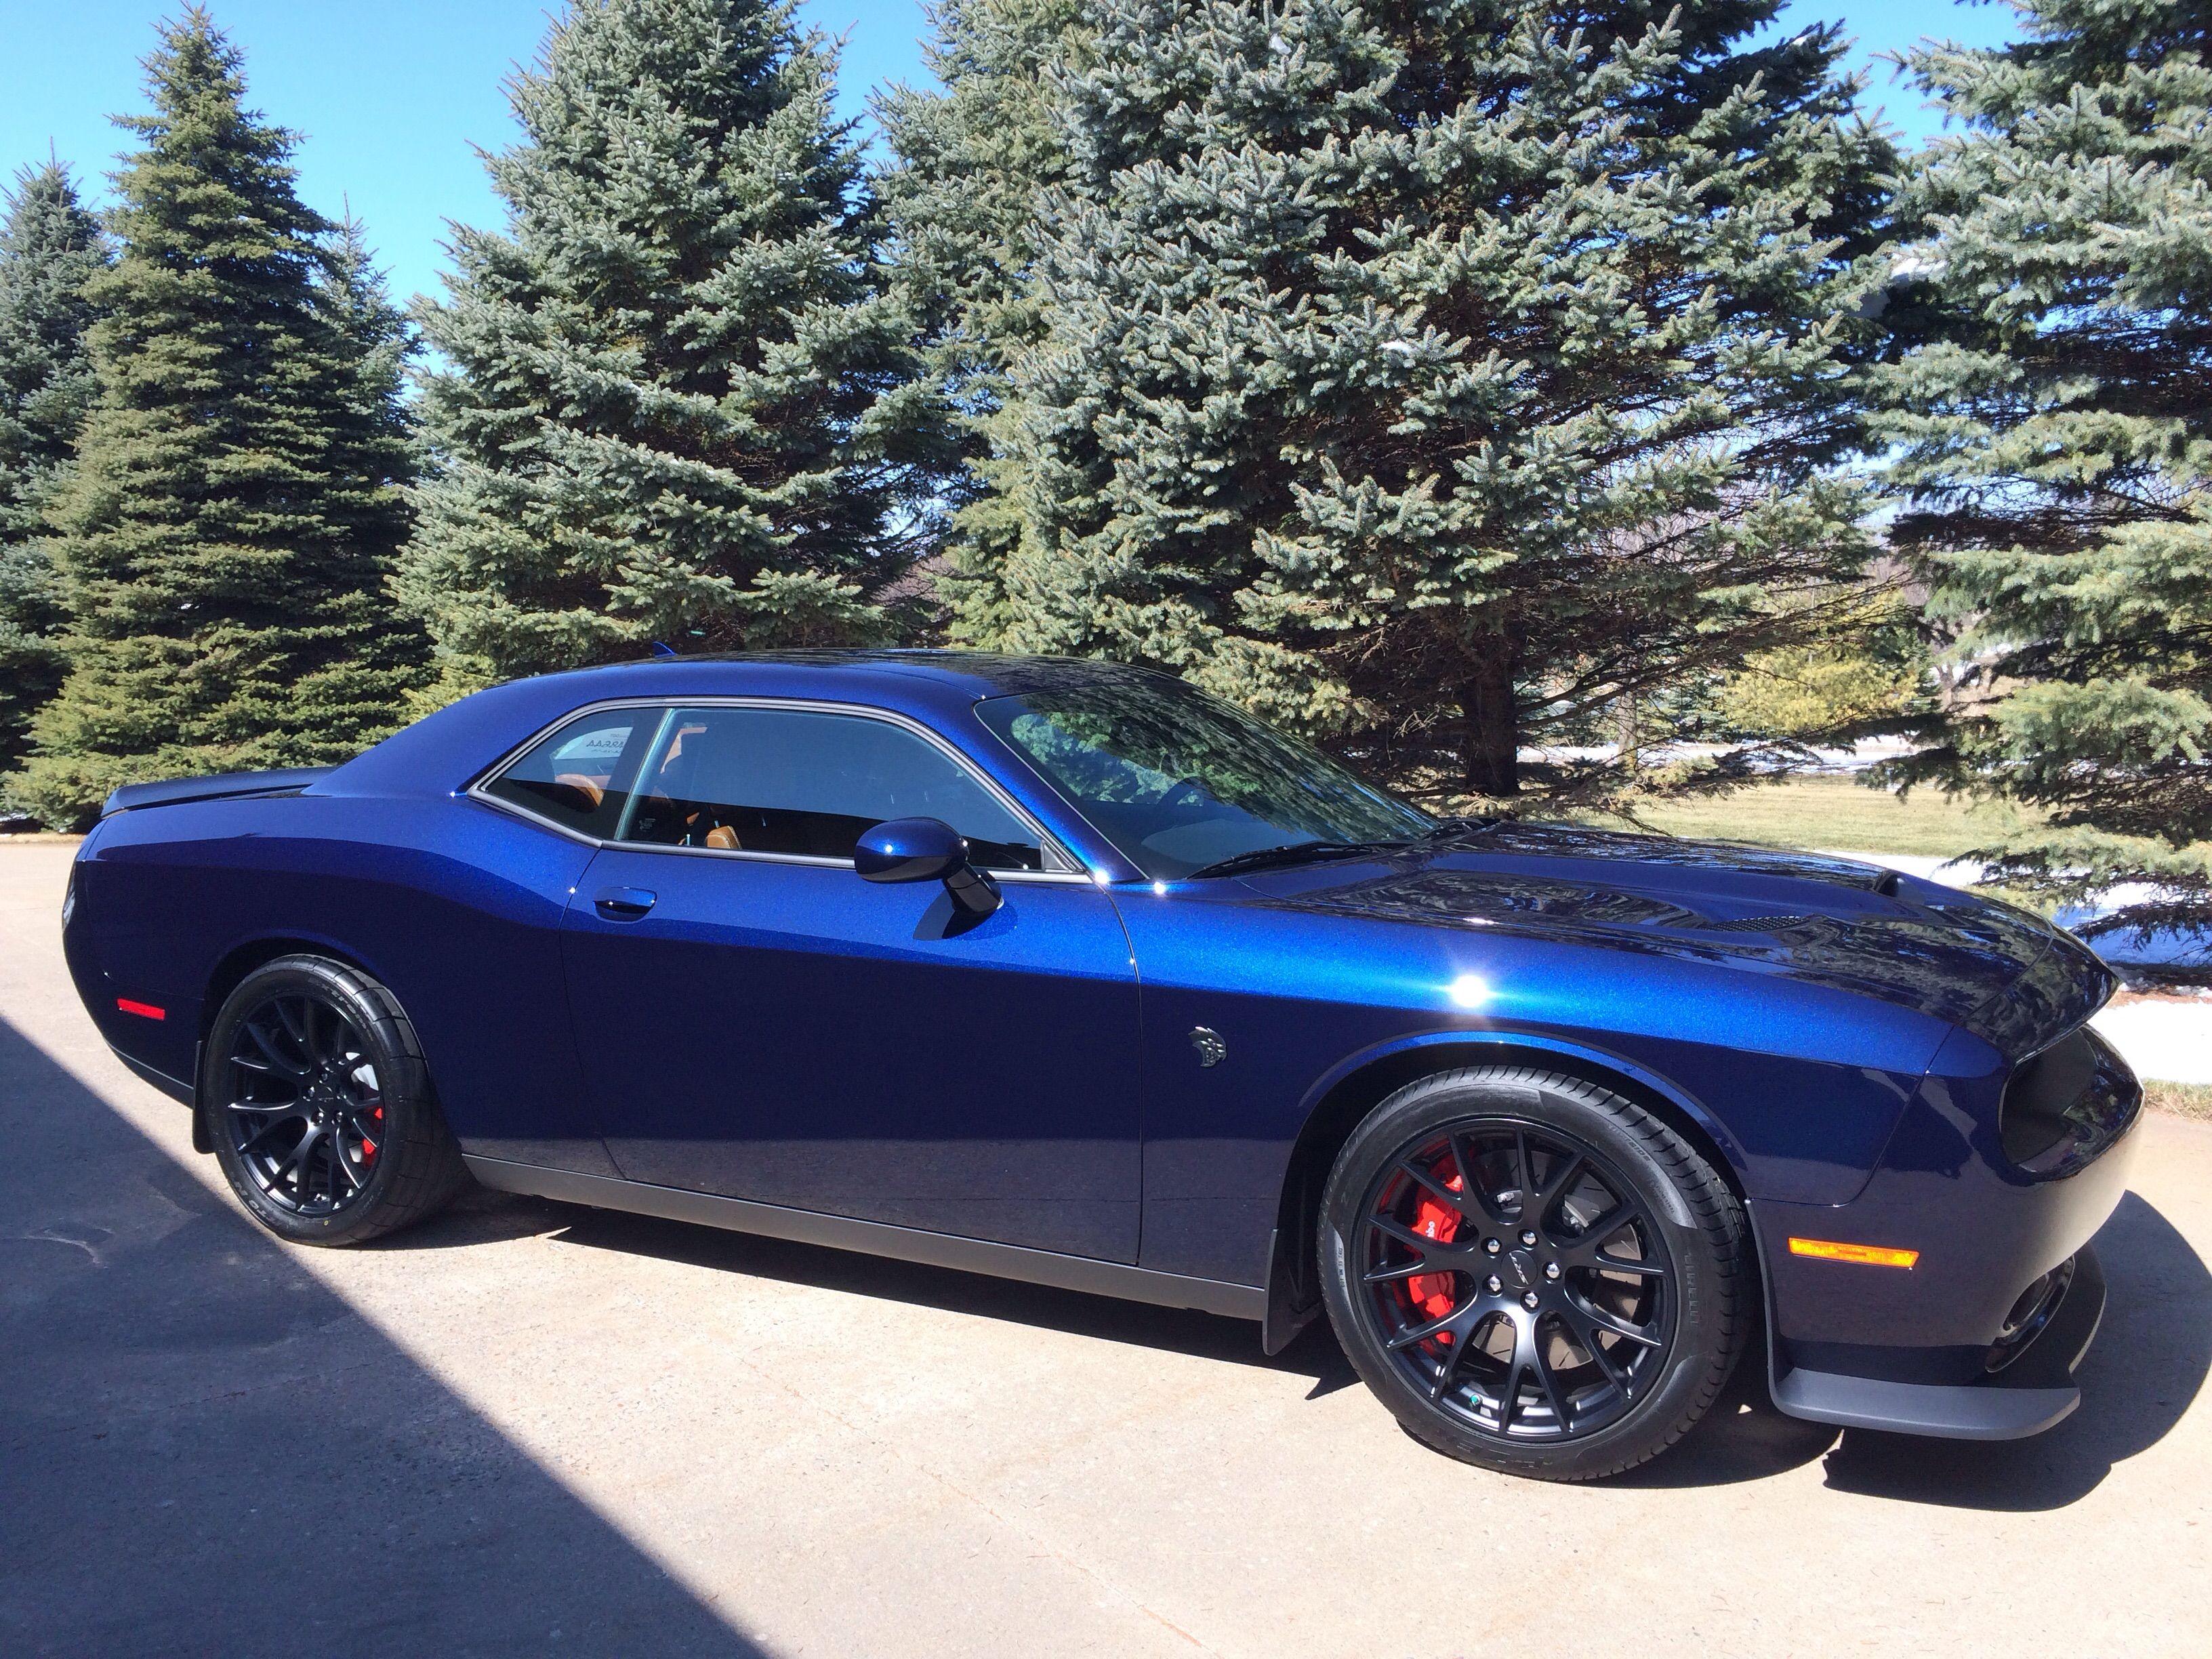 2016 Dodge Challenger Sxt Plus >> jazz blue challenger hellcat - Google Search | Hellcat and Demon | Pinterest | Challenger ...